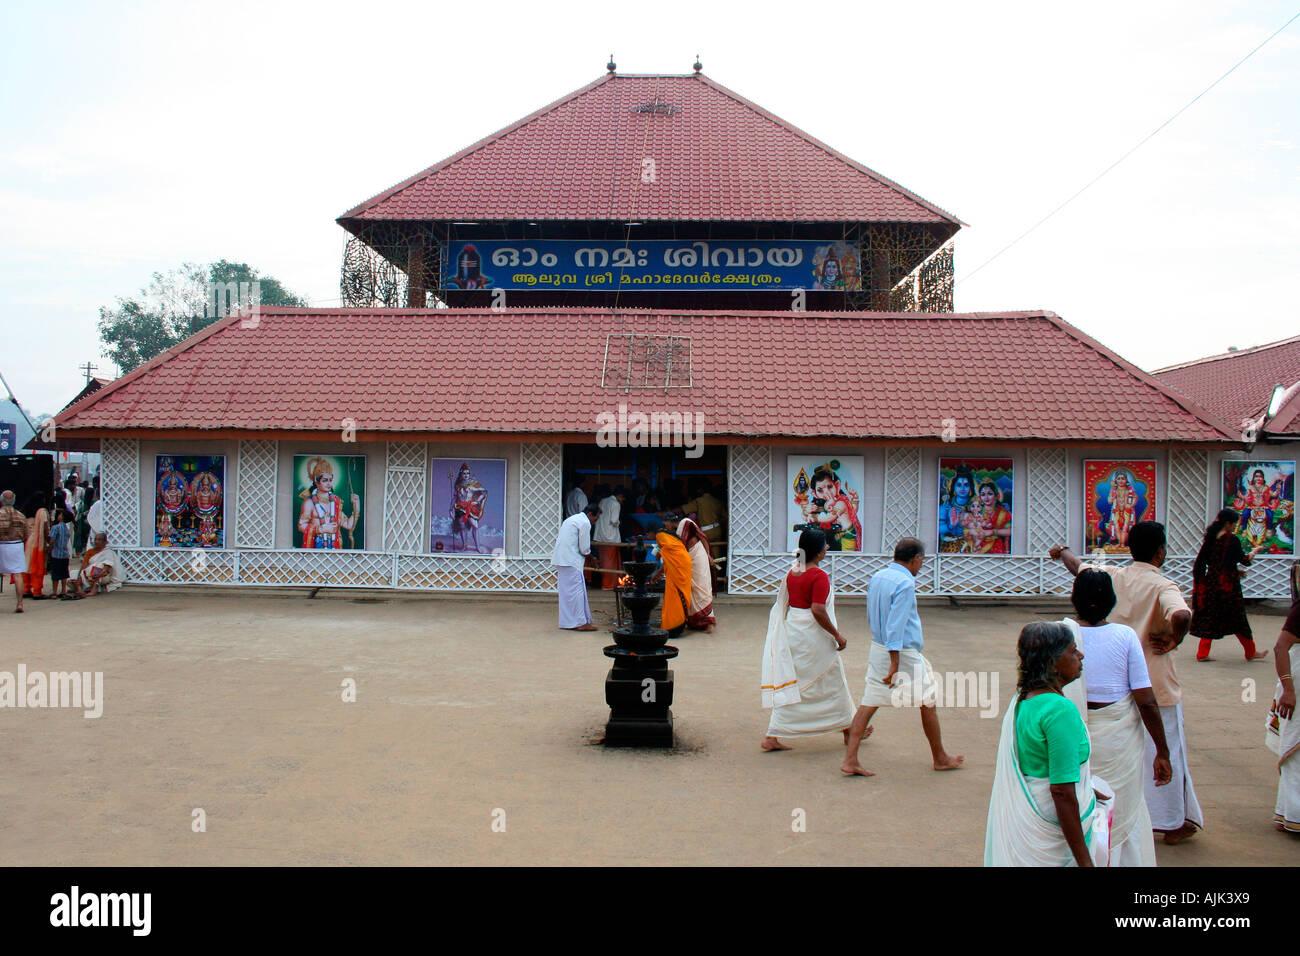 The temple of Lord Shiva in Aluva, Kerala, India - Stock Image